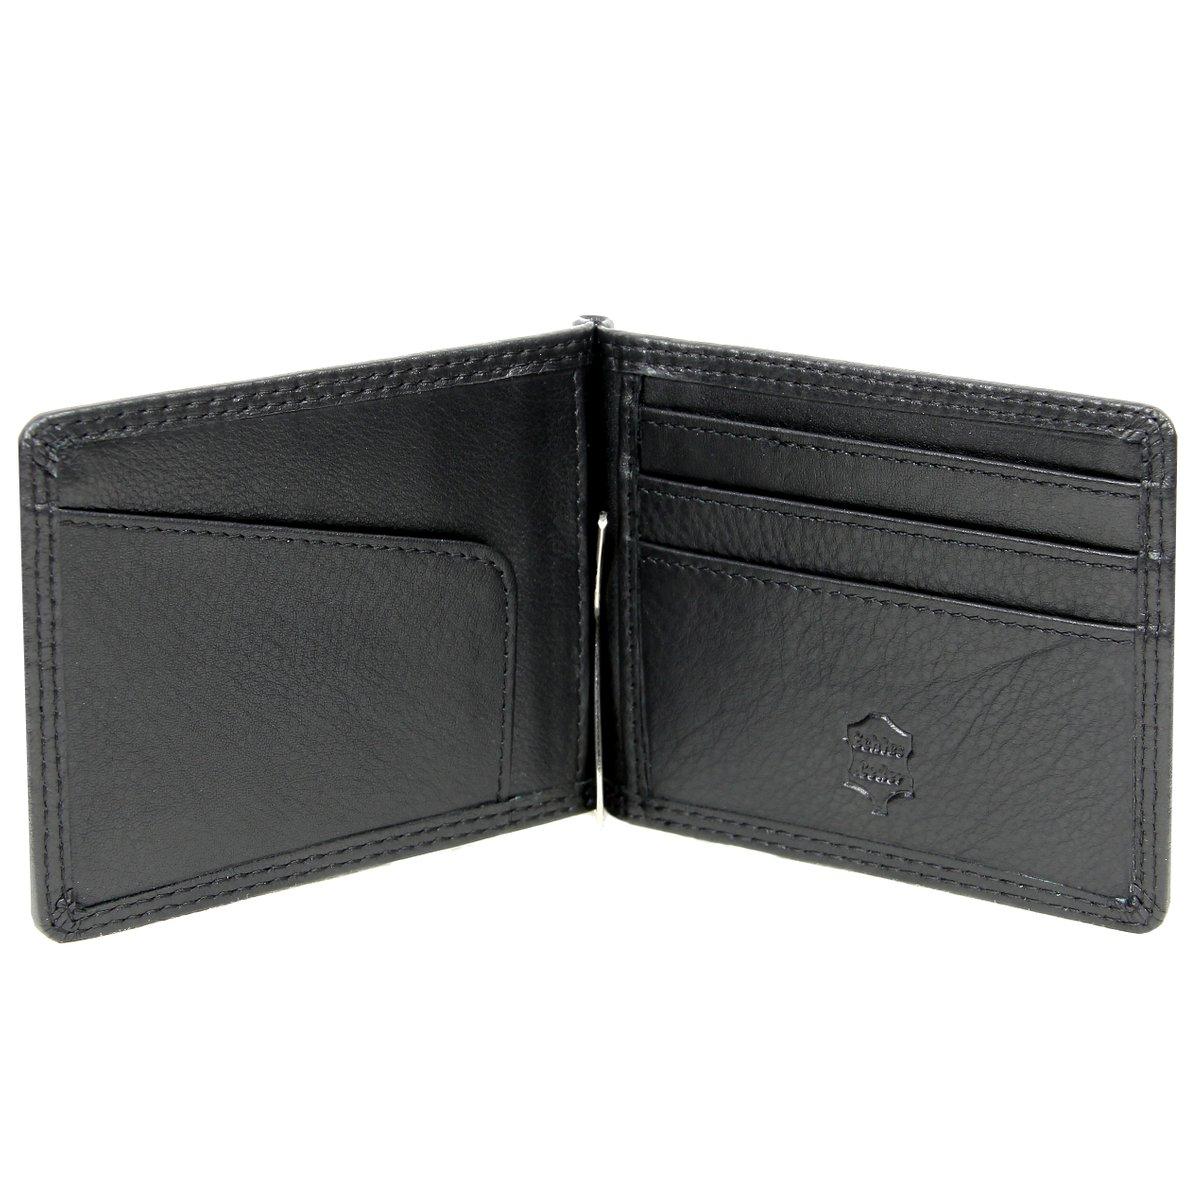 Dollarclip Geldklammer Geldbörse Leder schwarz